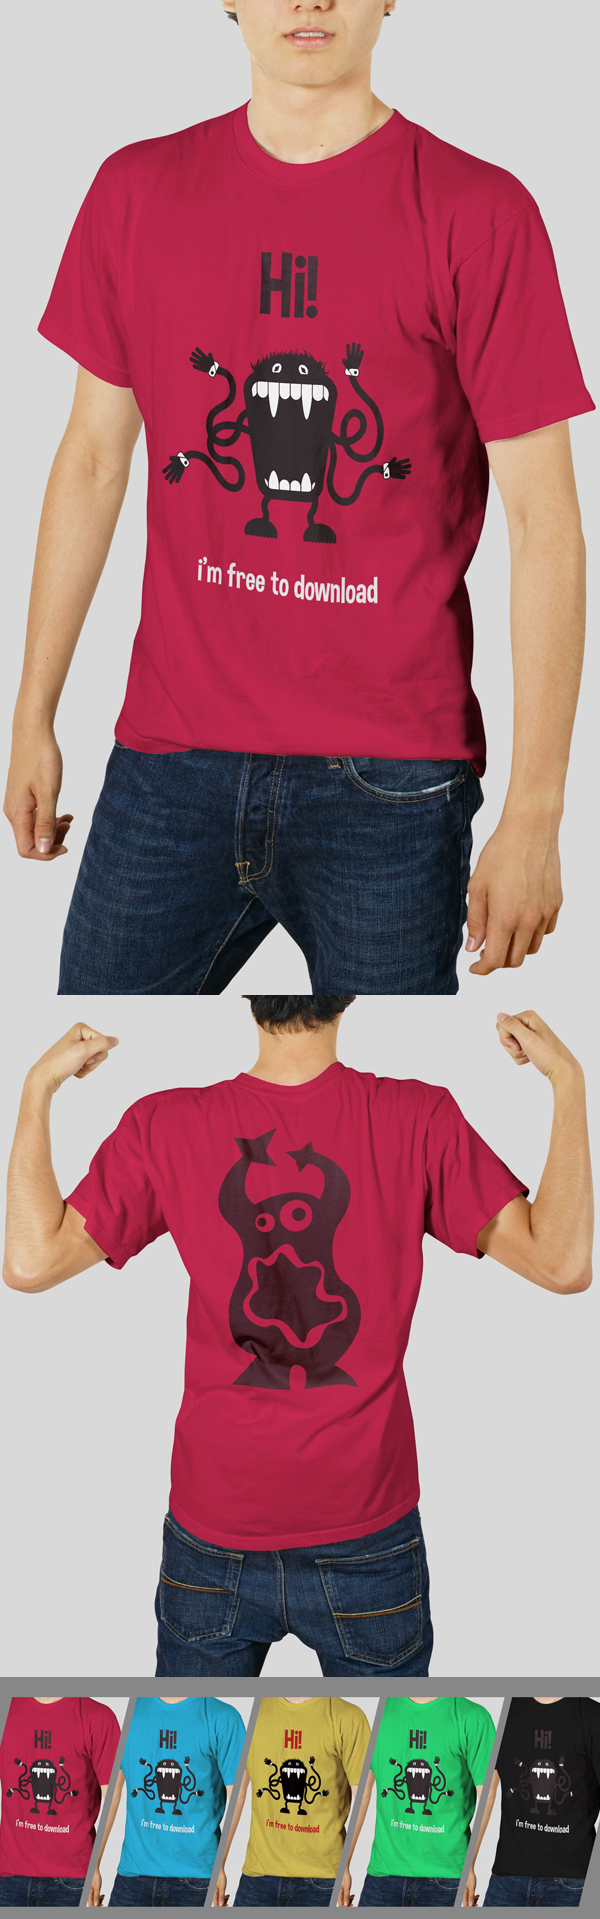 Tshirt Mockups Mockup Templates